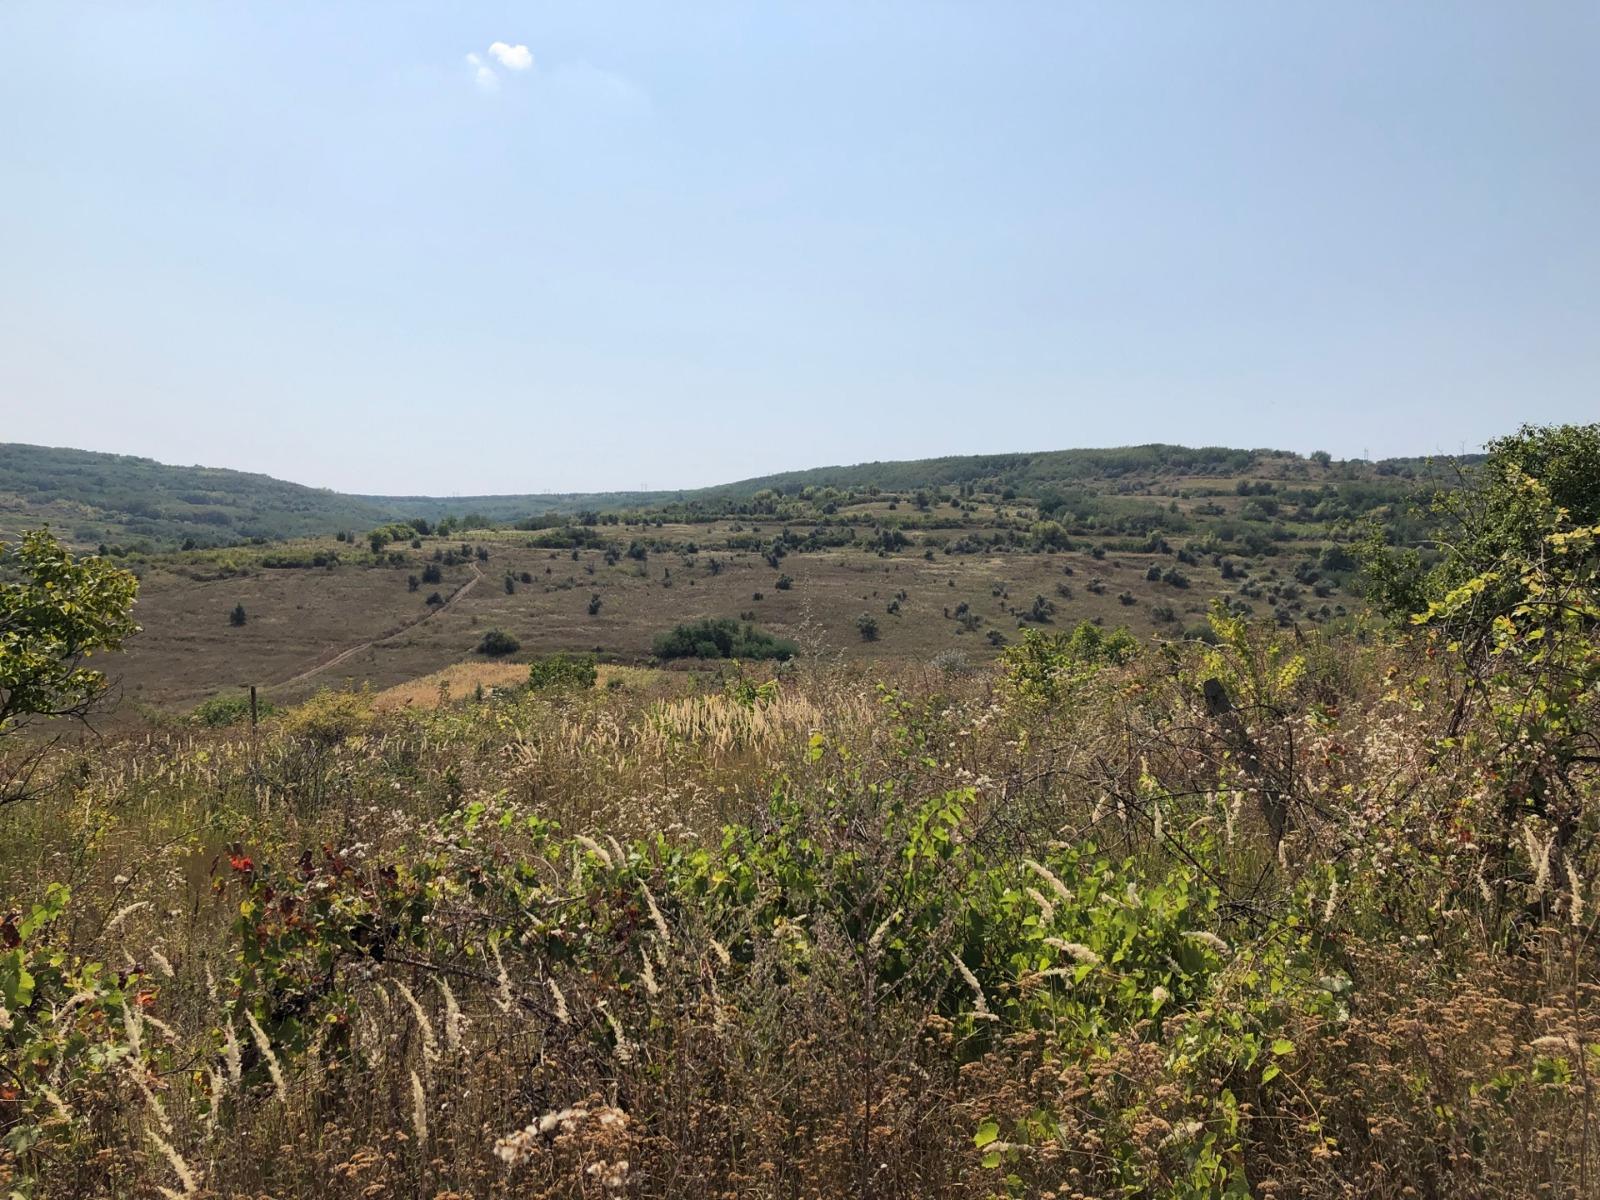 teren în degradare Moldova